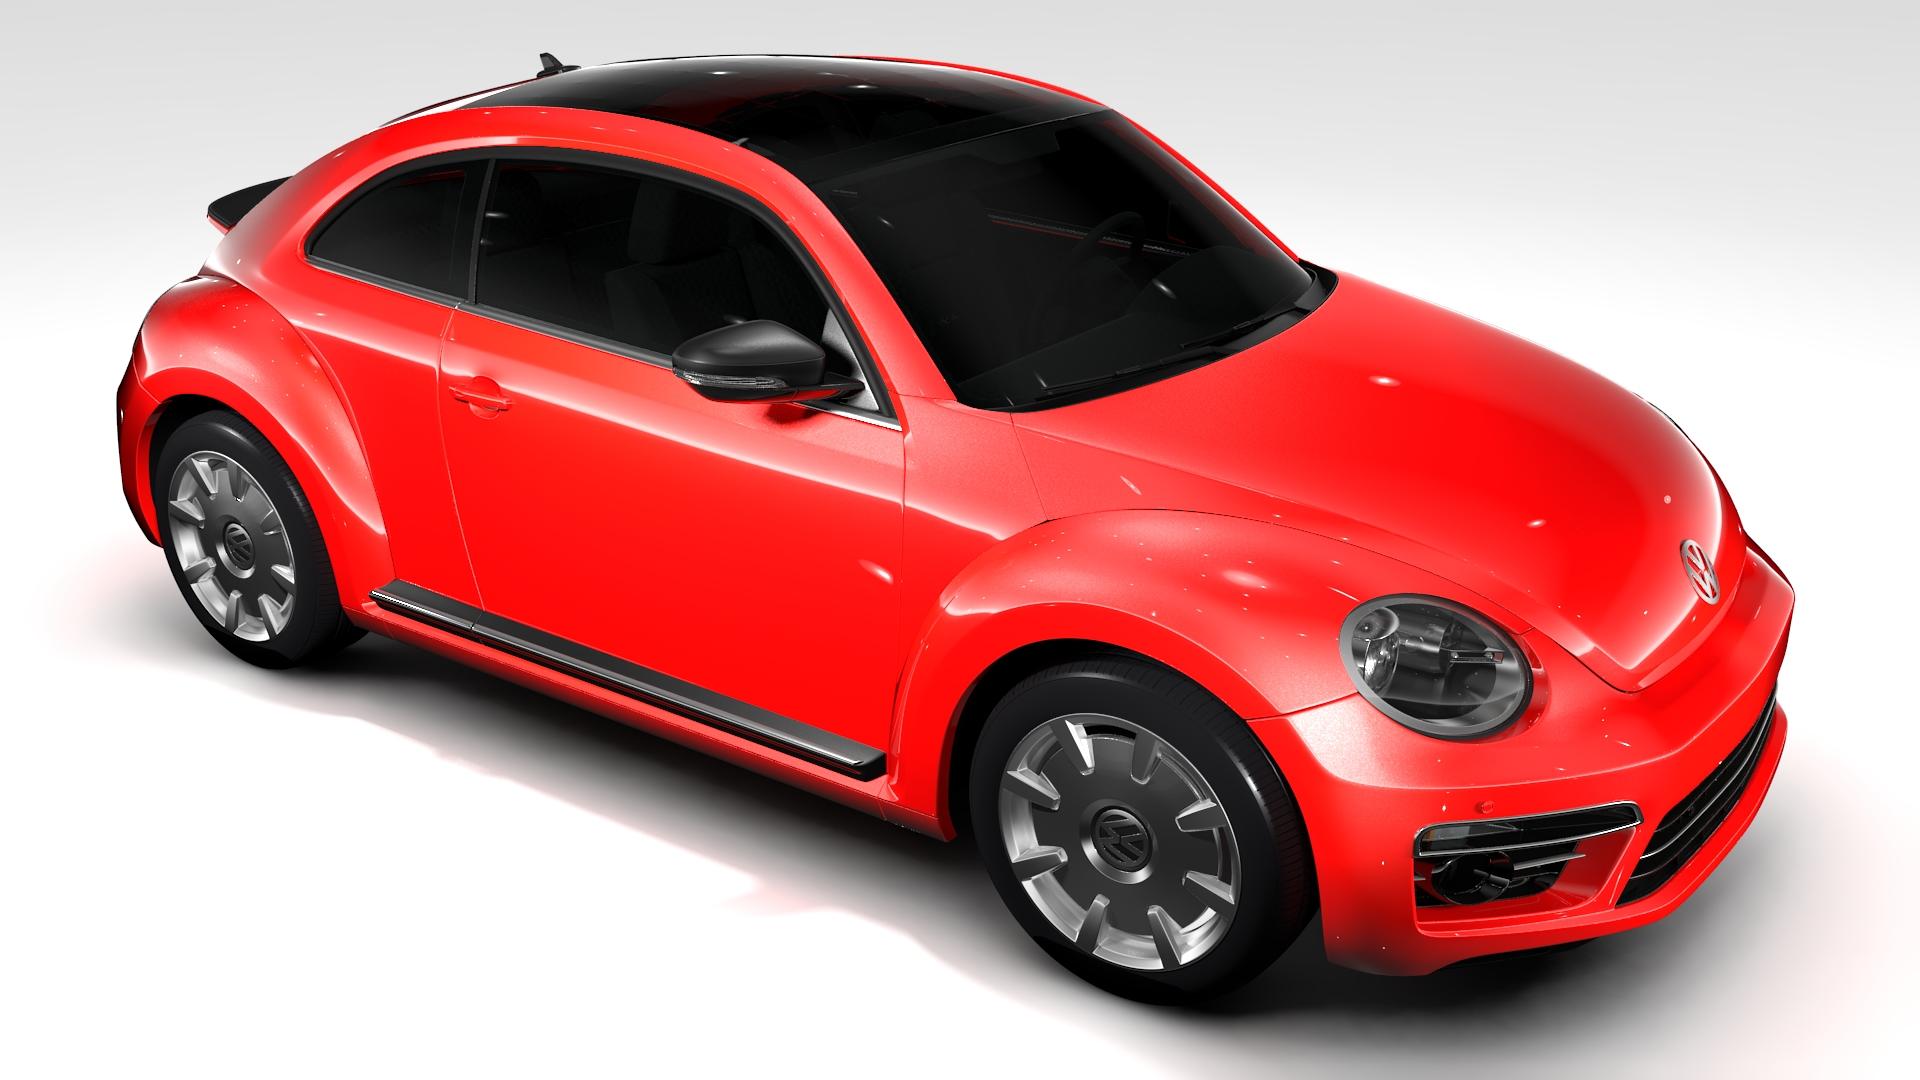 vw beetle turbo 2017 3d model 3ds max fbx c4d lwo ma mb hrc xsi obj 221667